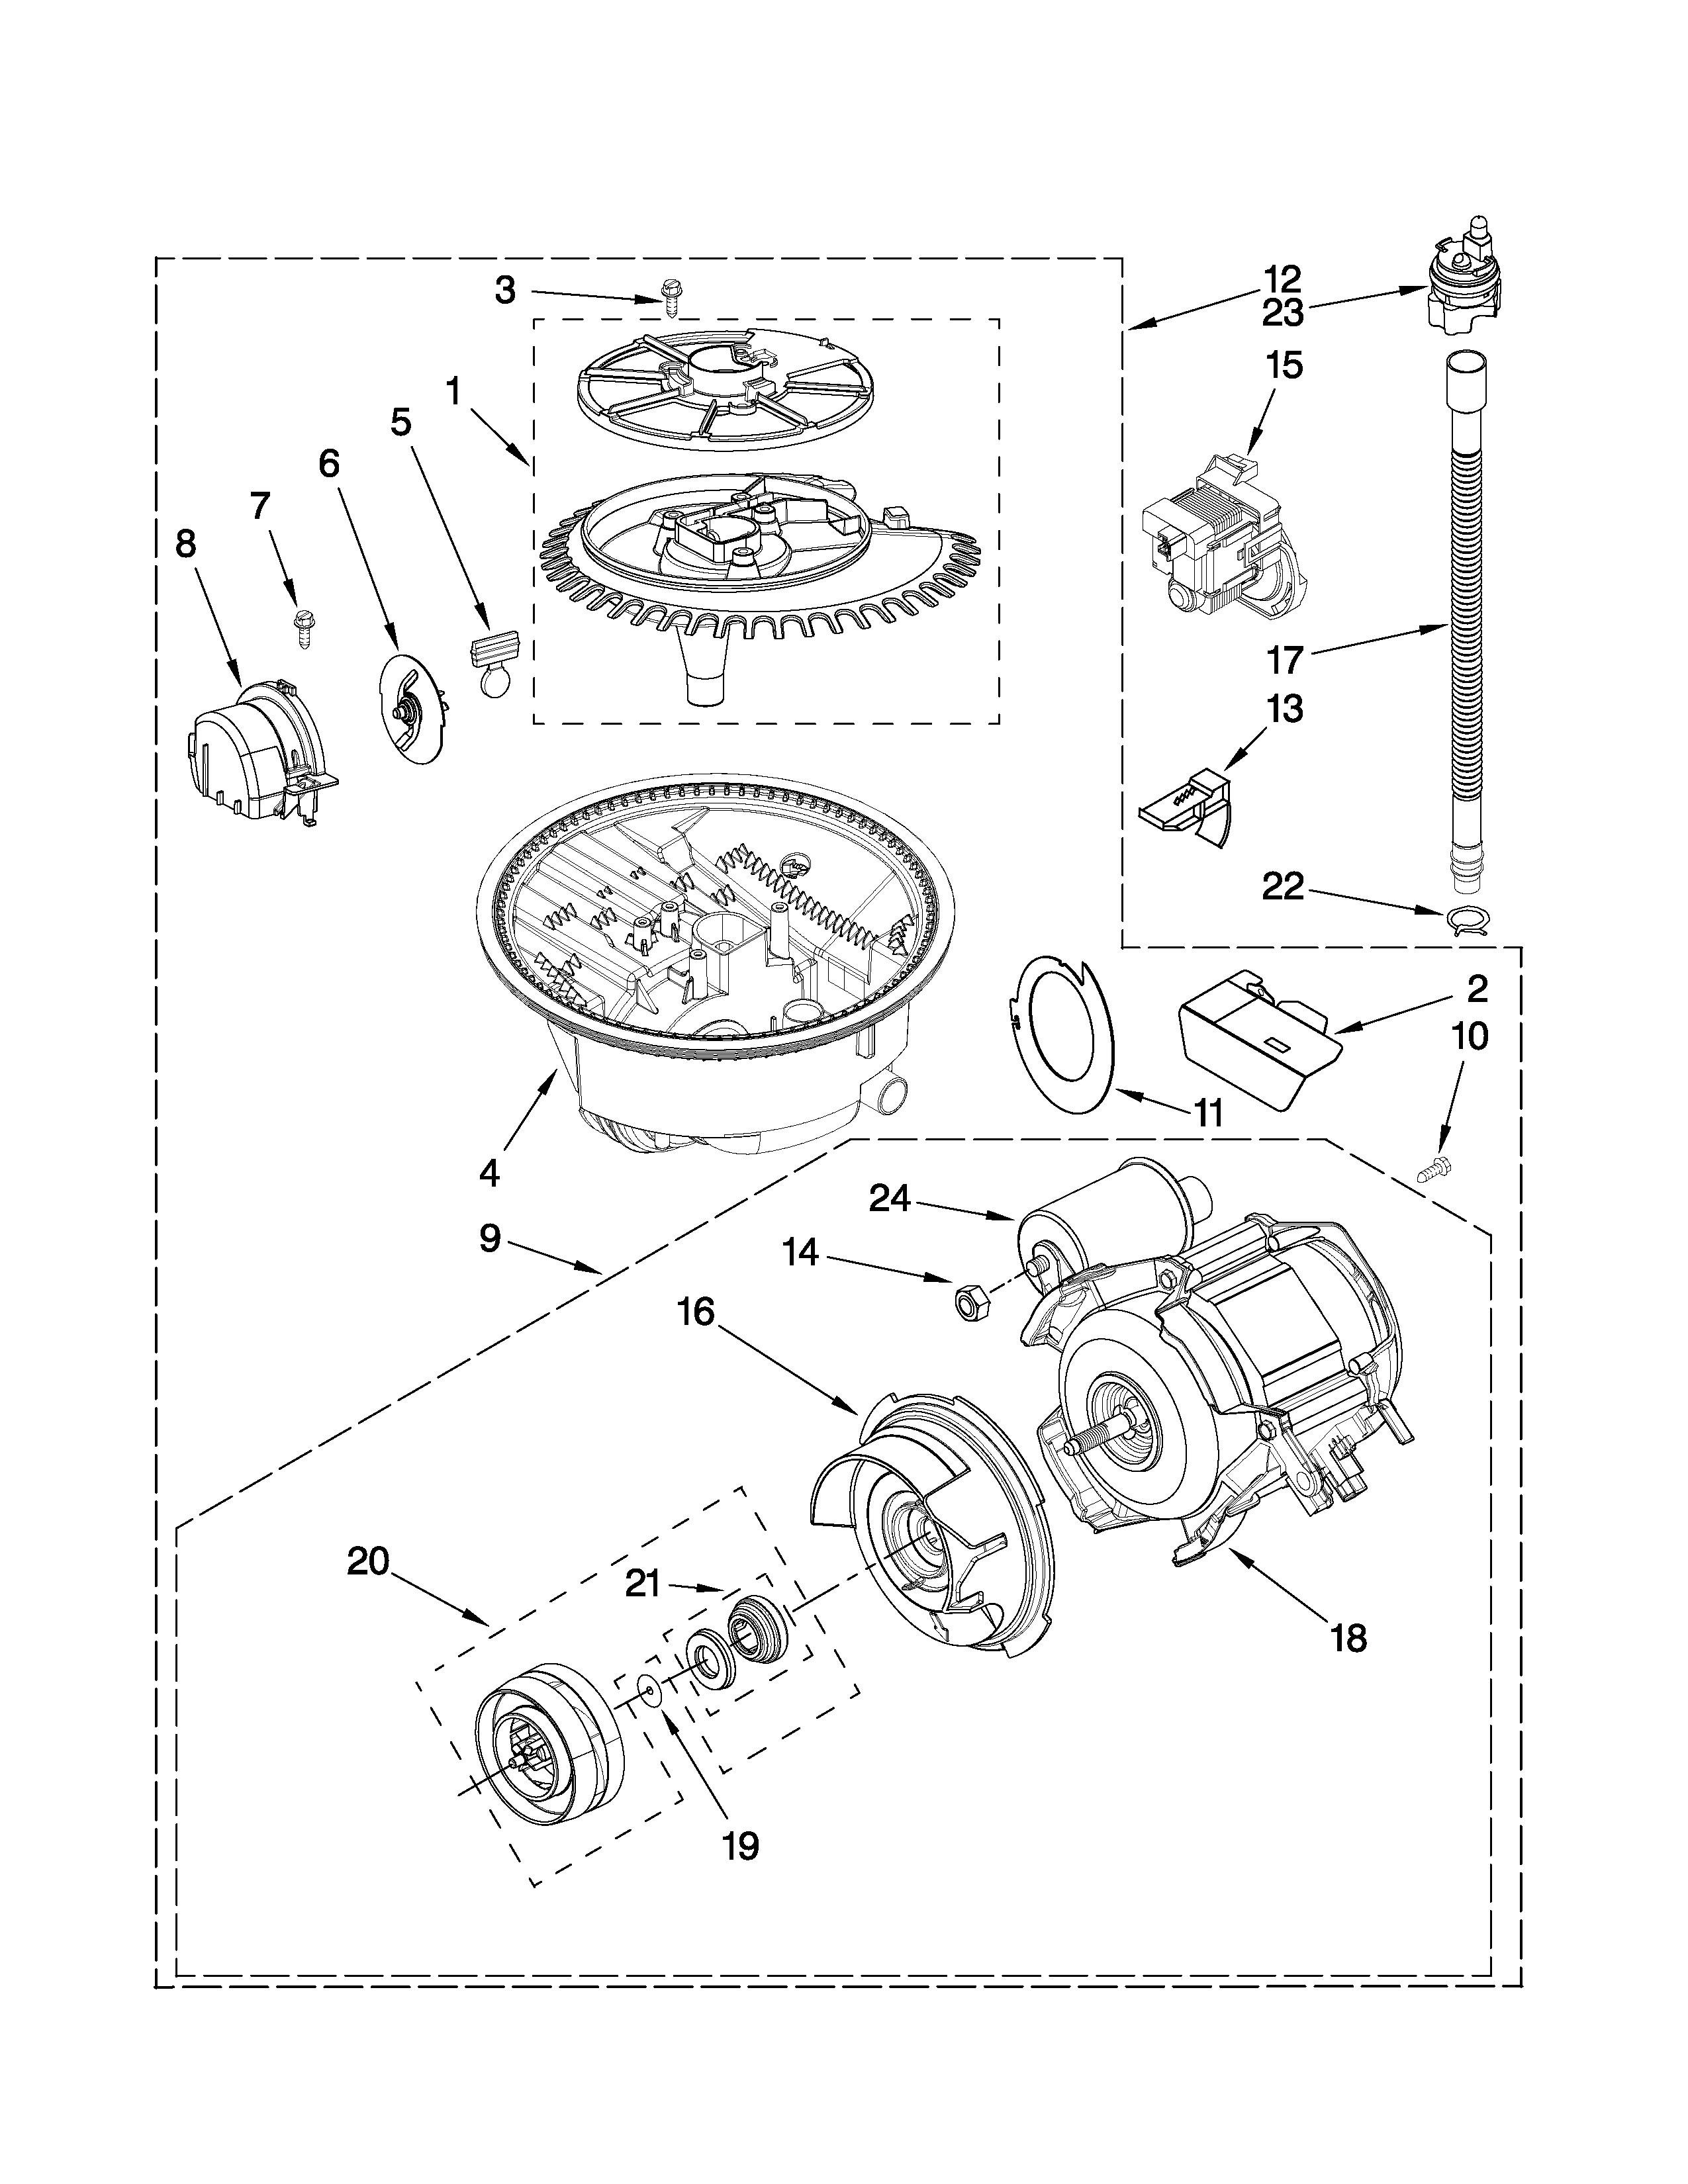 kenmore dishwasher model  665 13743k601  3 5 yrs old